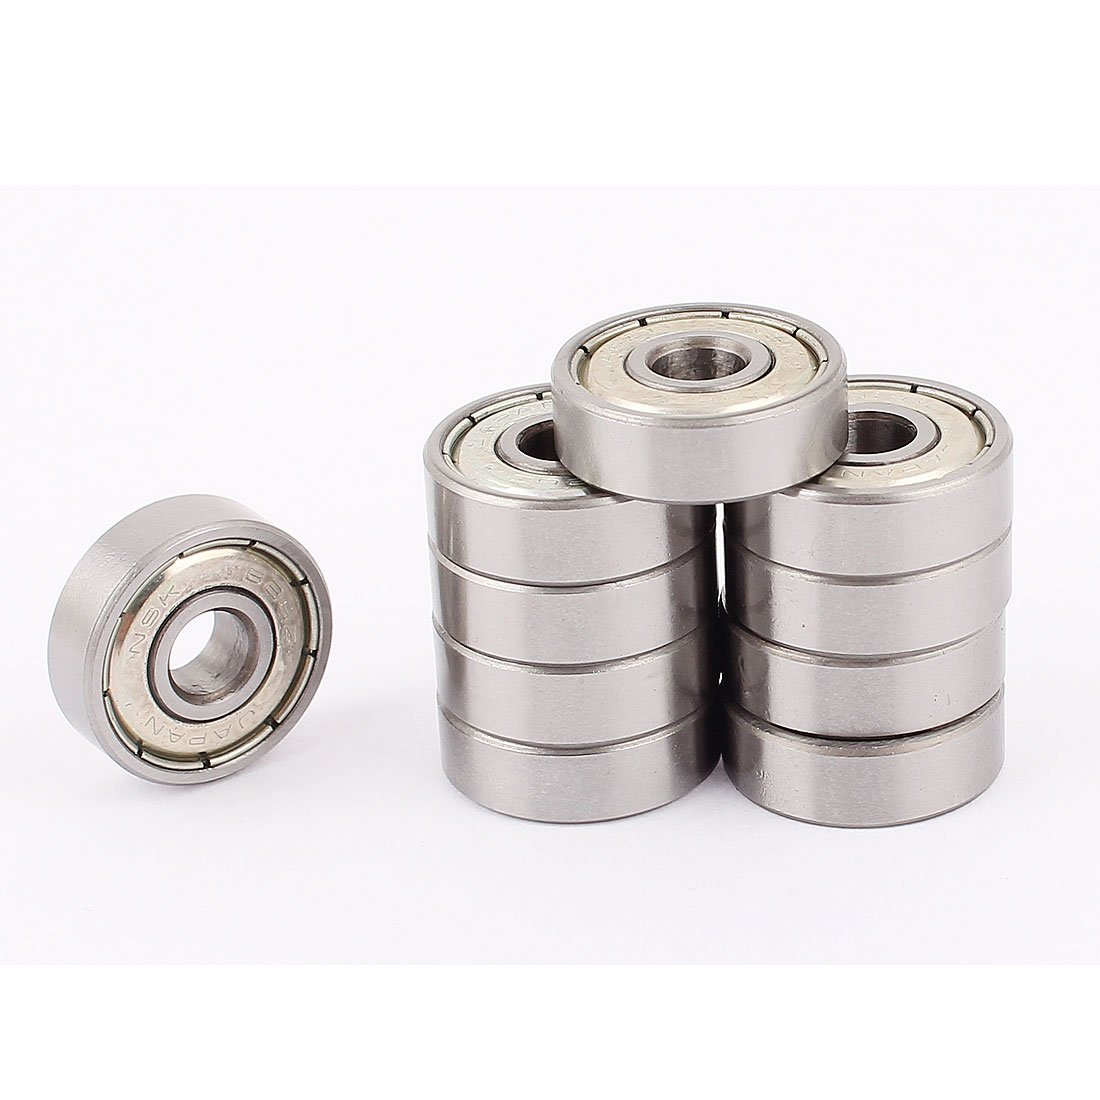 Uxcell a15060900ux0999 10Pcs 6mm x 19mm x 6mm 626Z Mini Deep Groove Ball Bearing (Pack of 10)